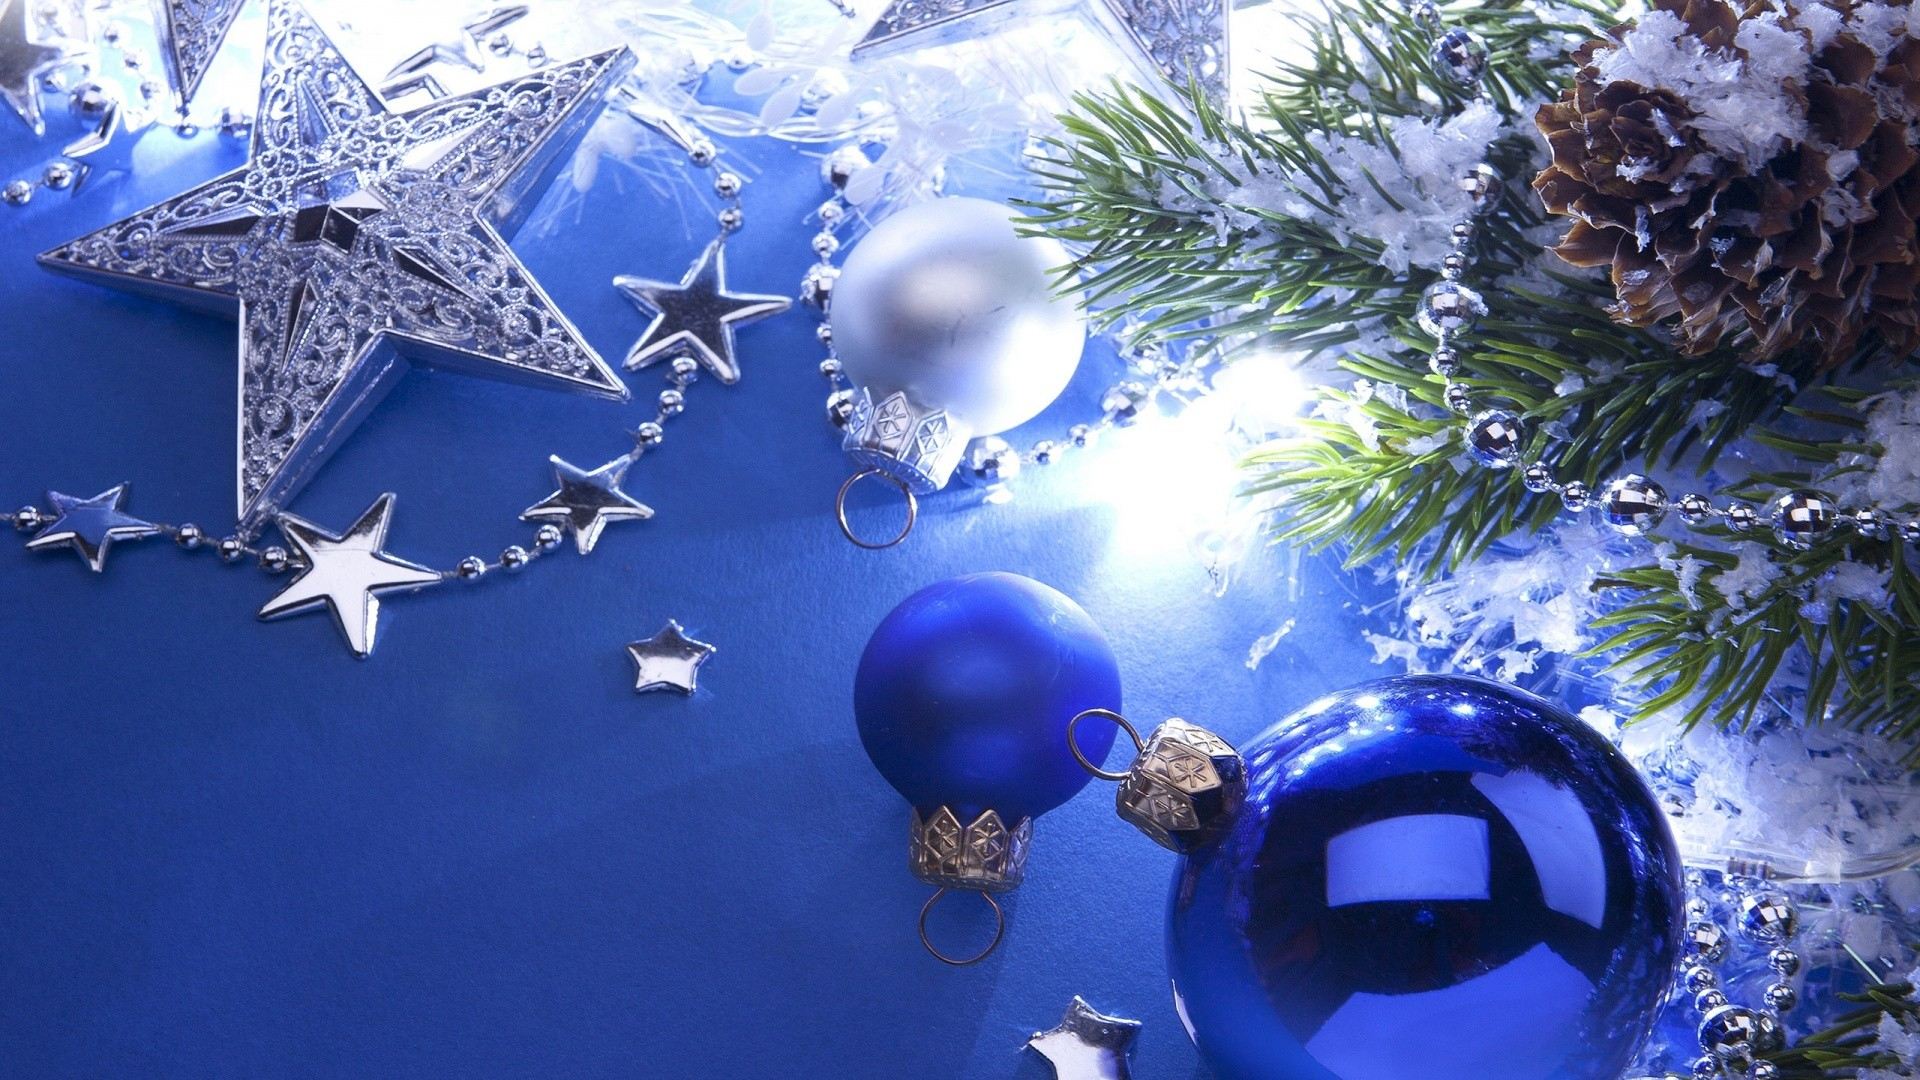 Wallpaper Christmas decoration